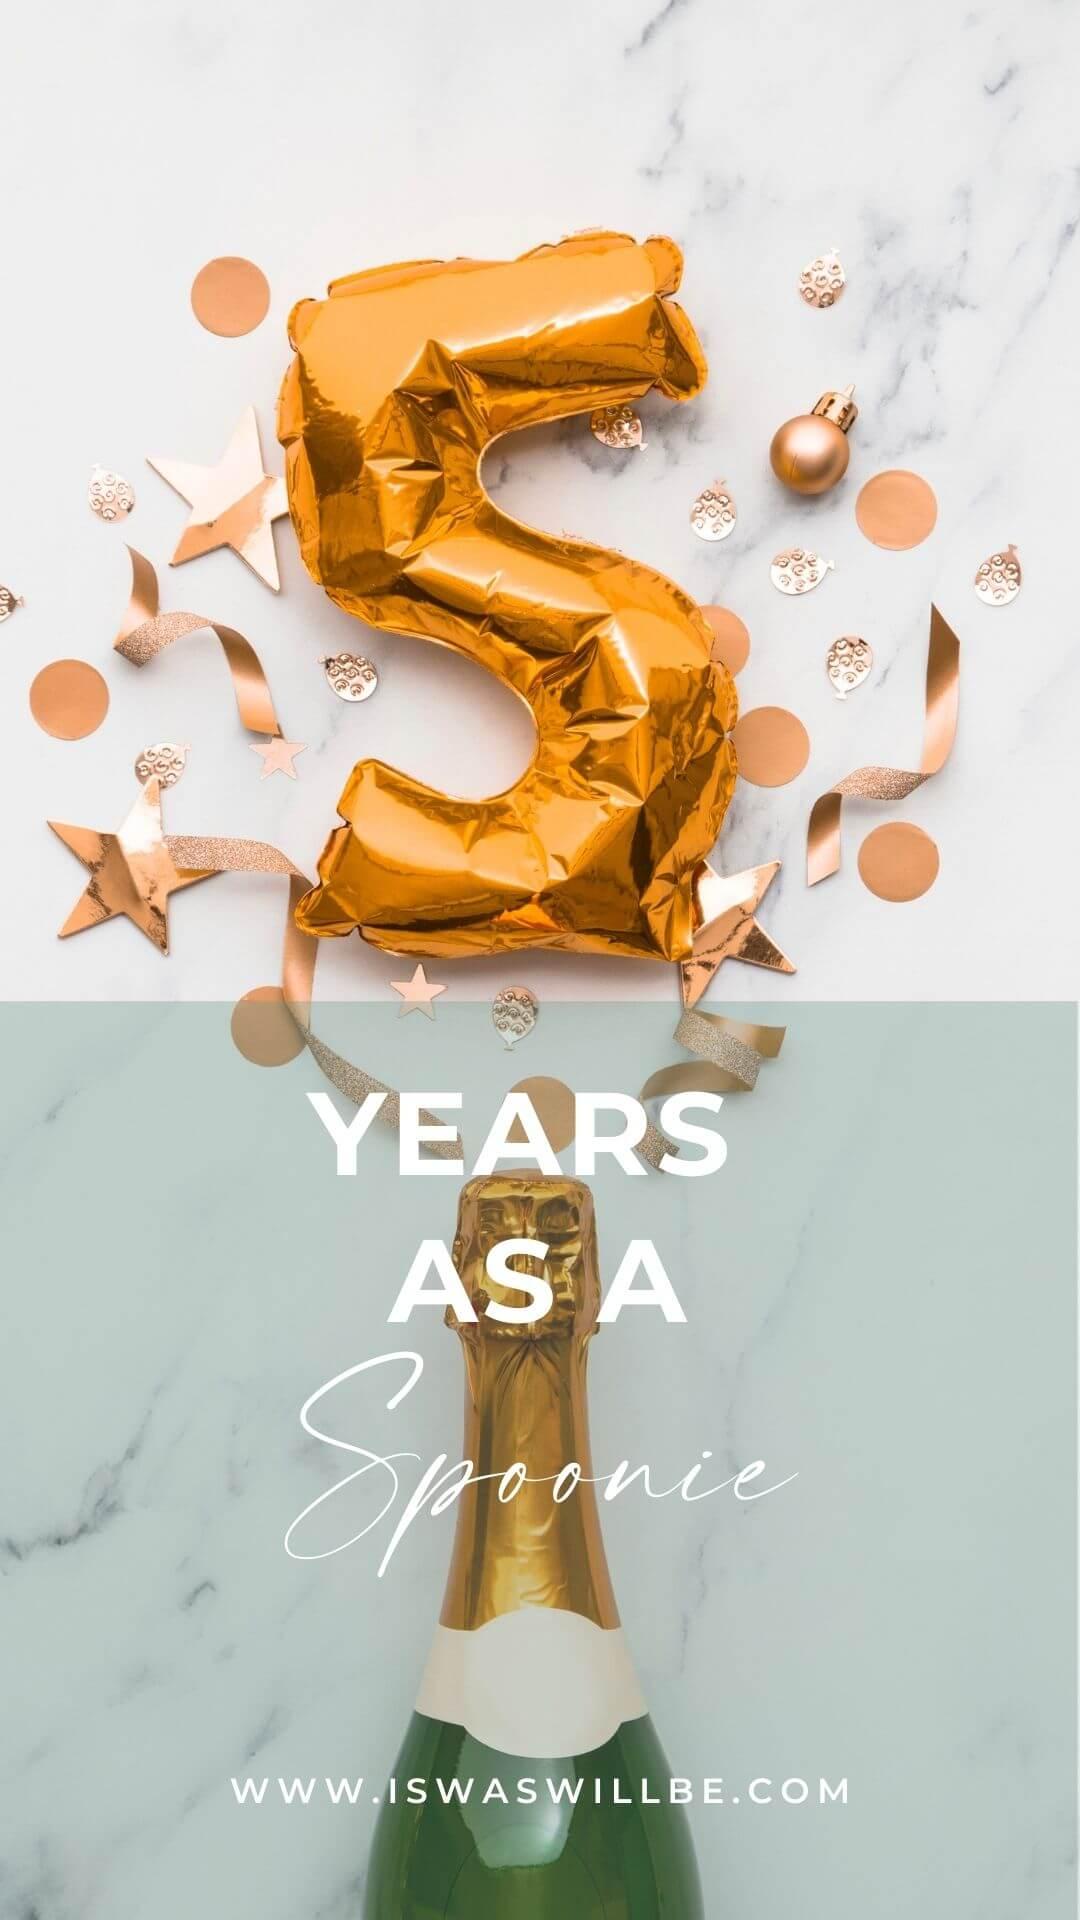 5 years as a spoonie